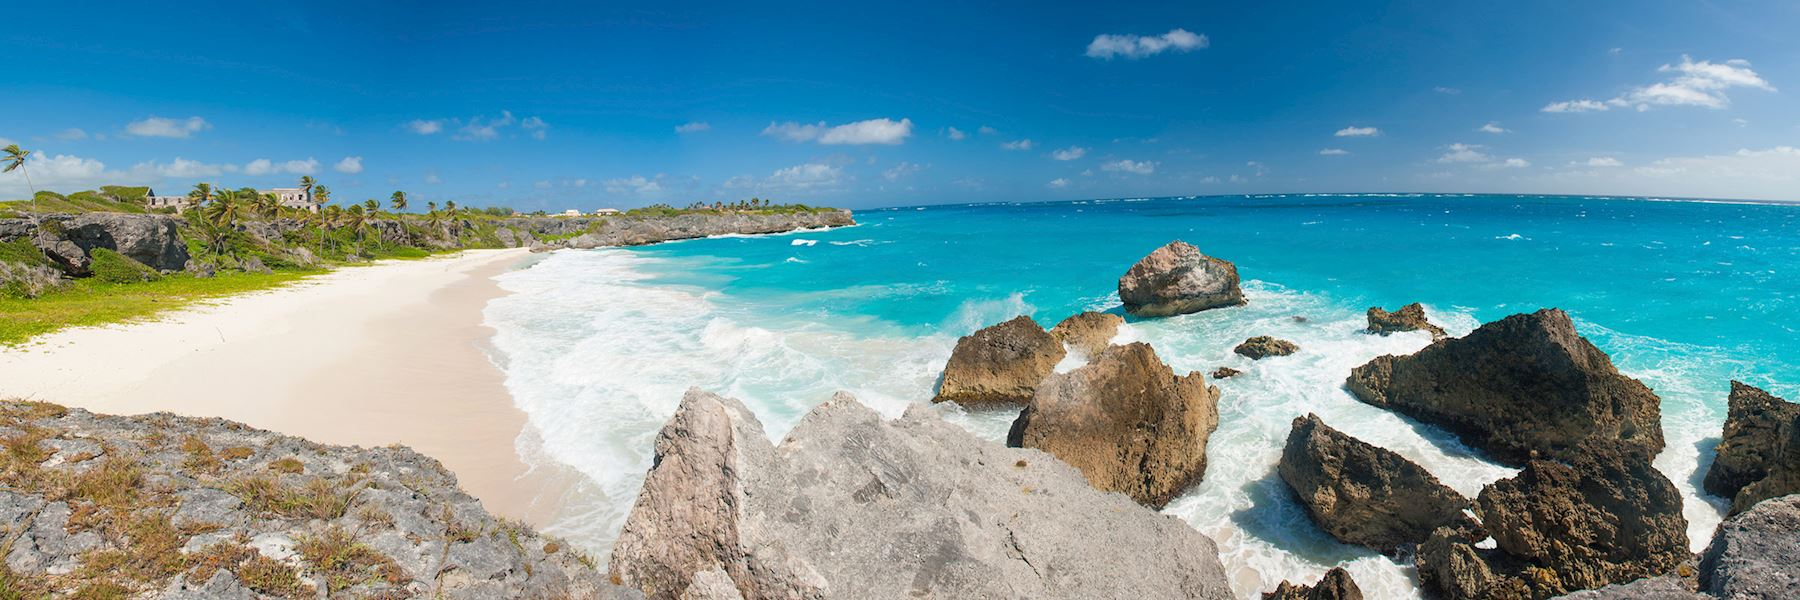 Barbados travel advice